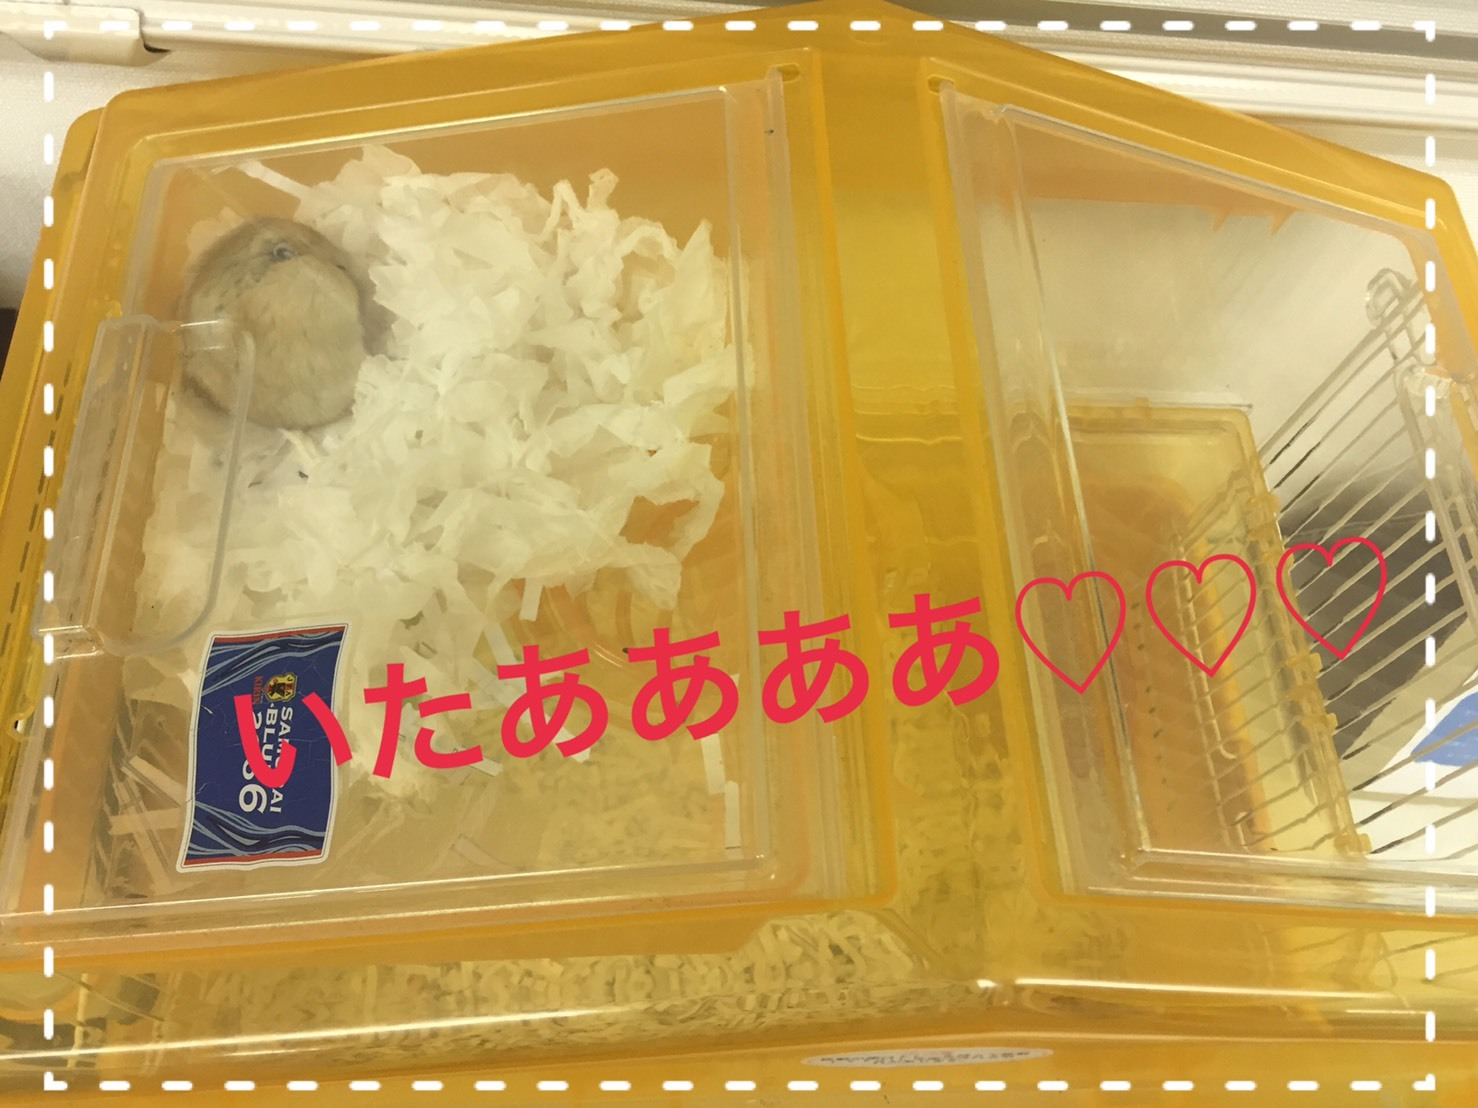 S__5267463.jpg